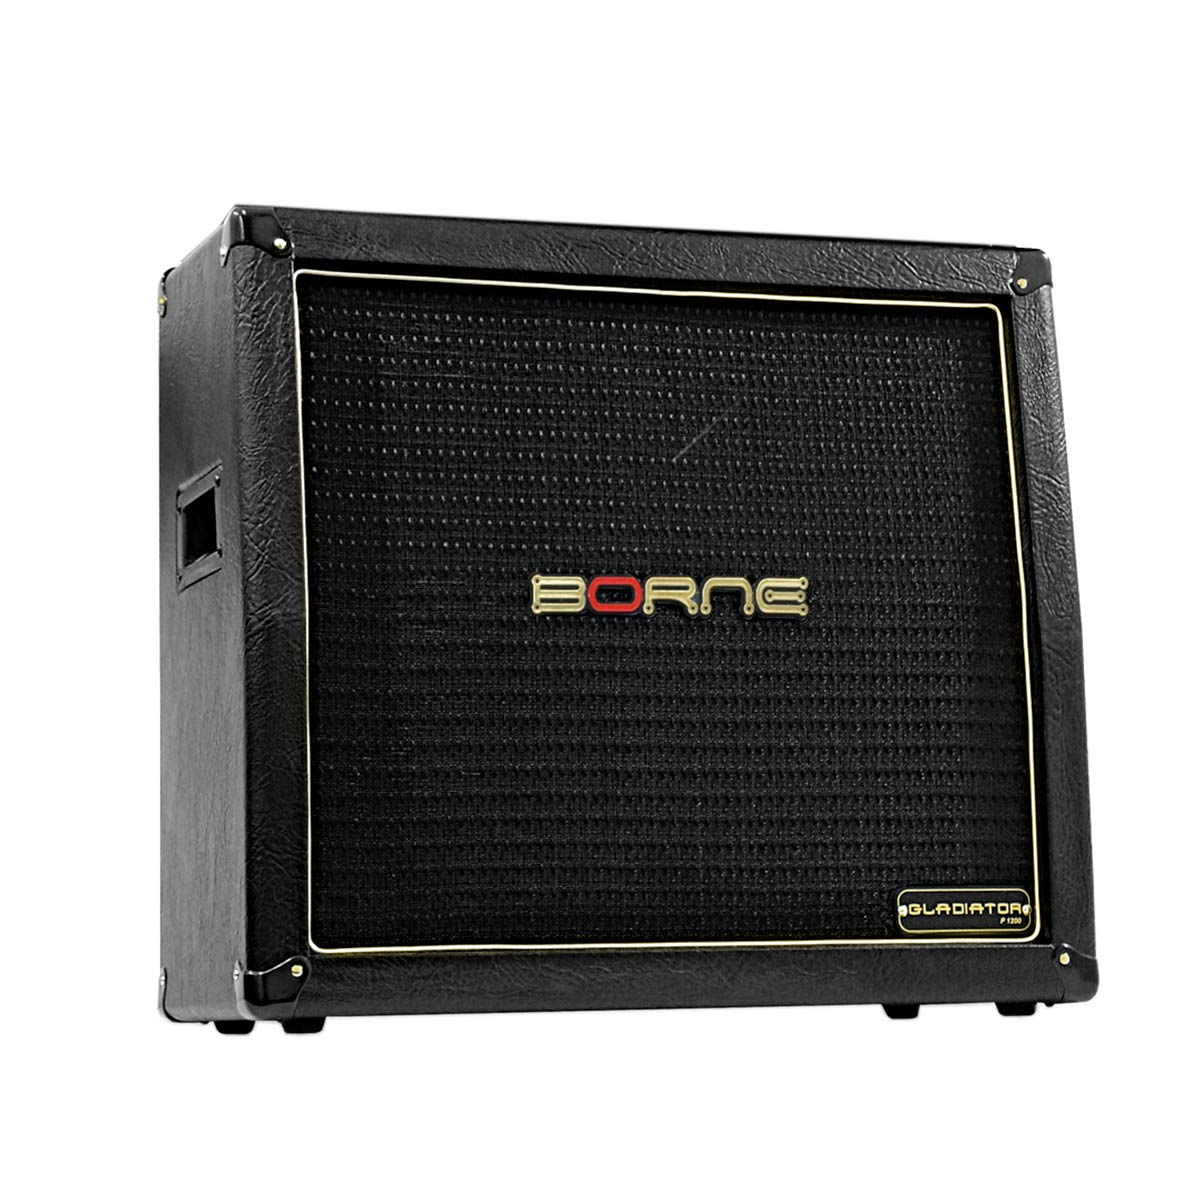 Caixa Passiva p/ Guitarra Fal 4x8 Pol 100W - Gladiator 1200 P Borne